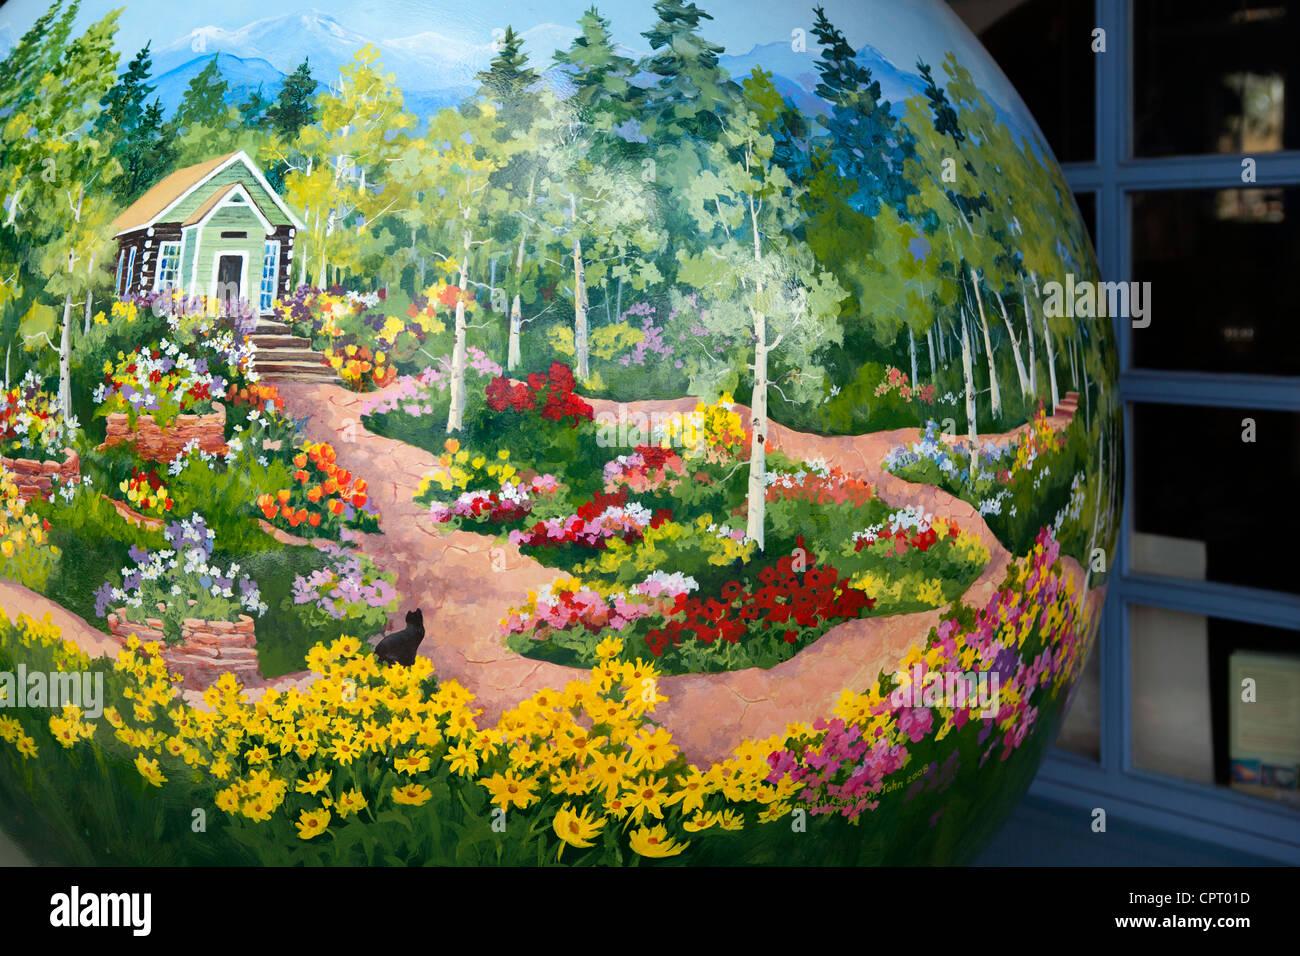 Kunst Stuck Betty Ford Alpine Gardens Vail Kunstlerin Cheryl